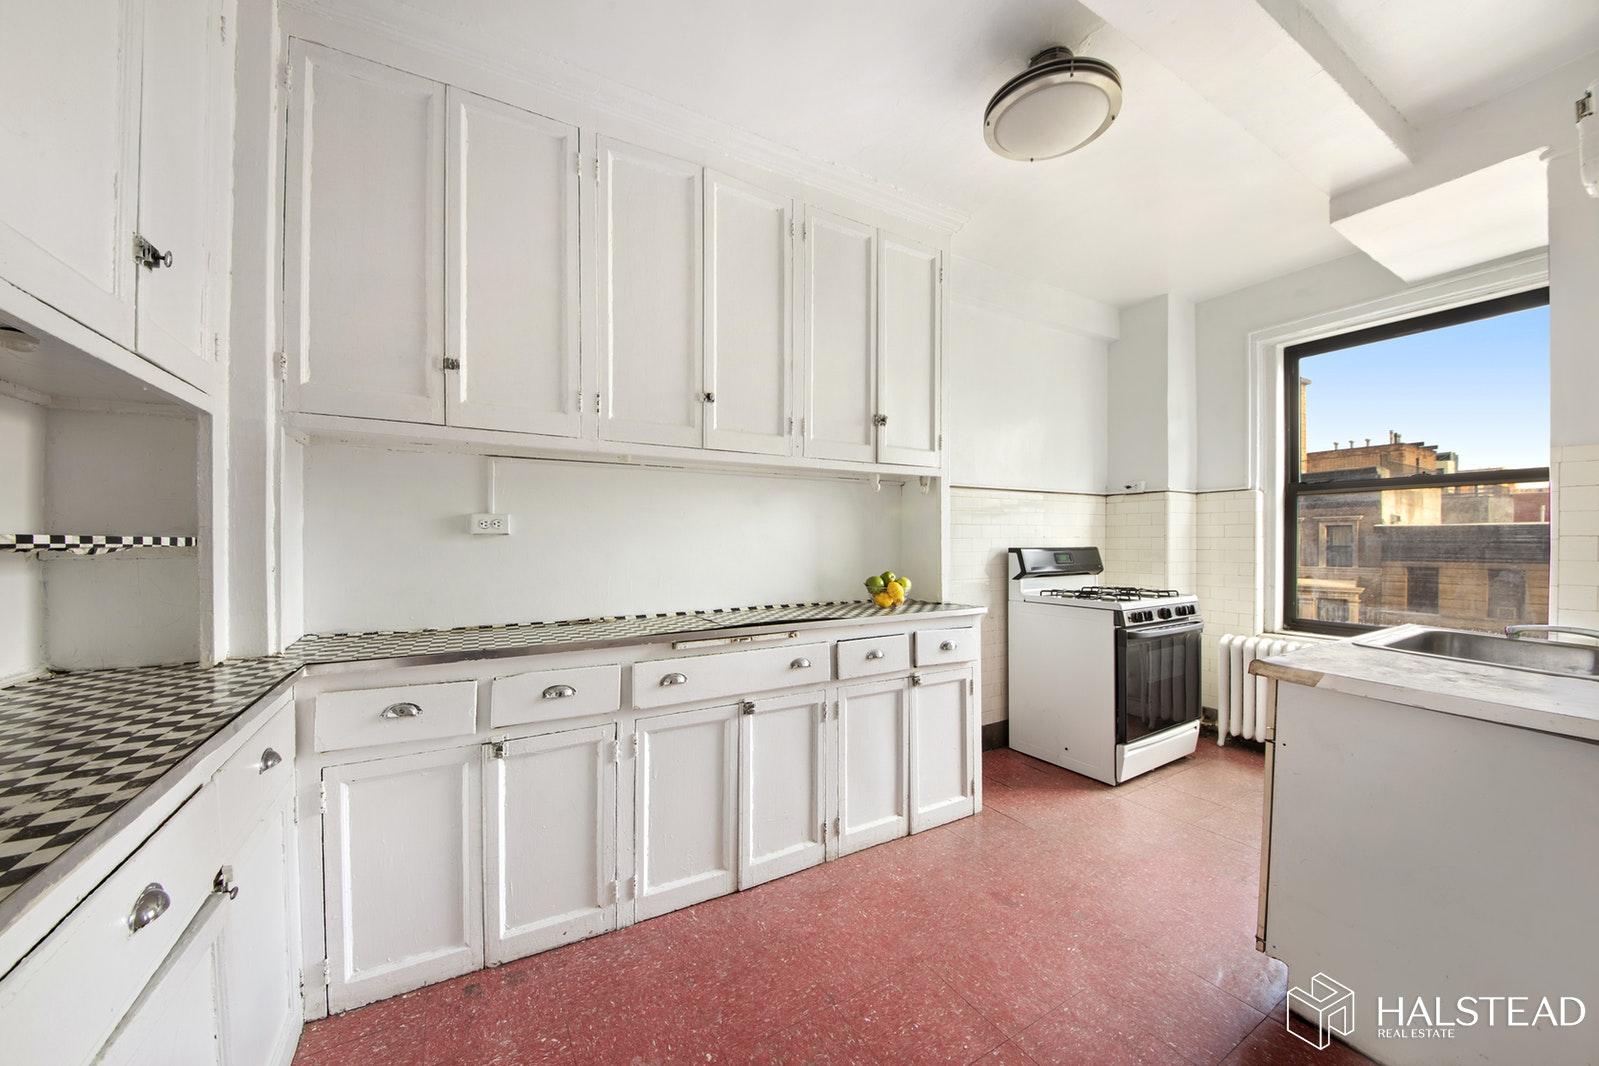 Apartment for sale at 845 West End Avenue, Apt 7B